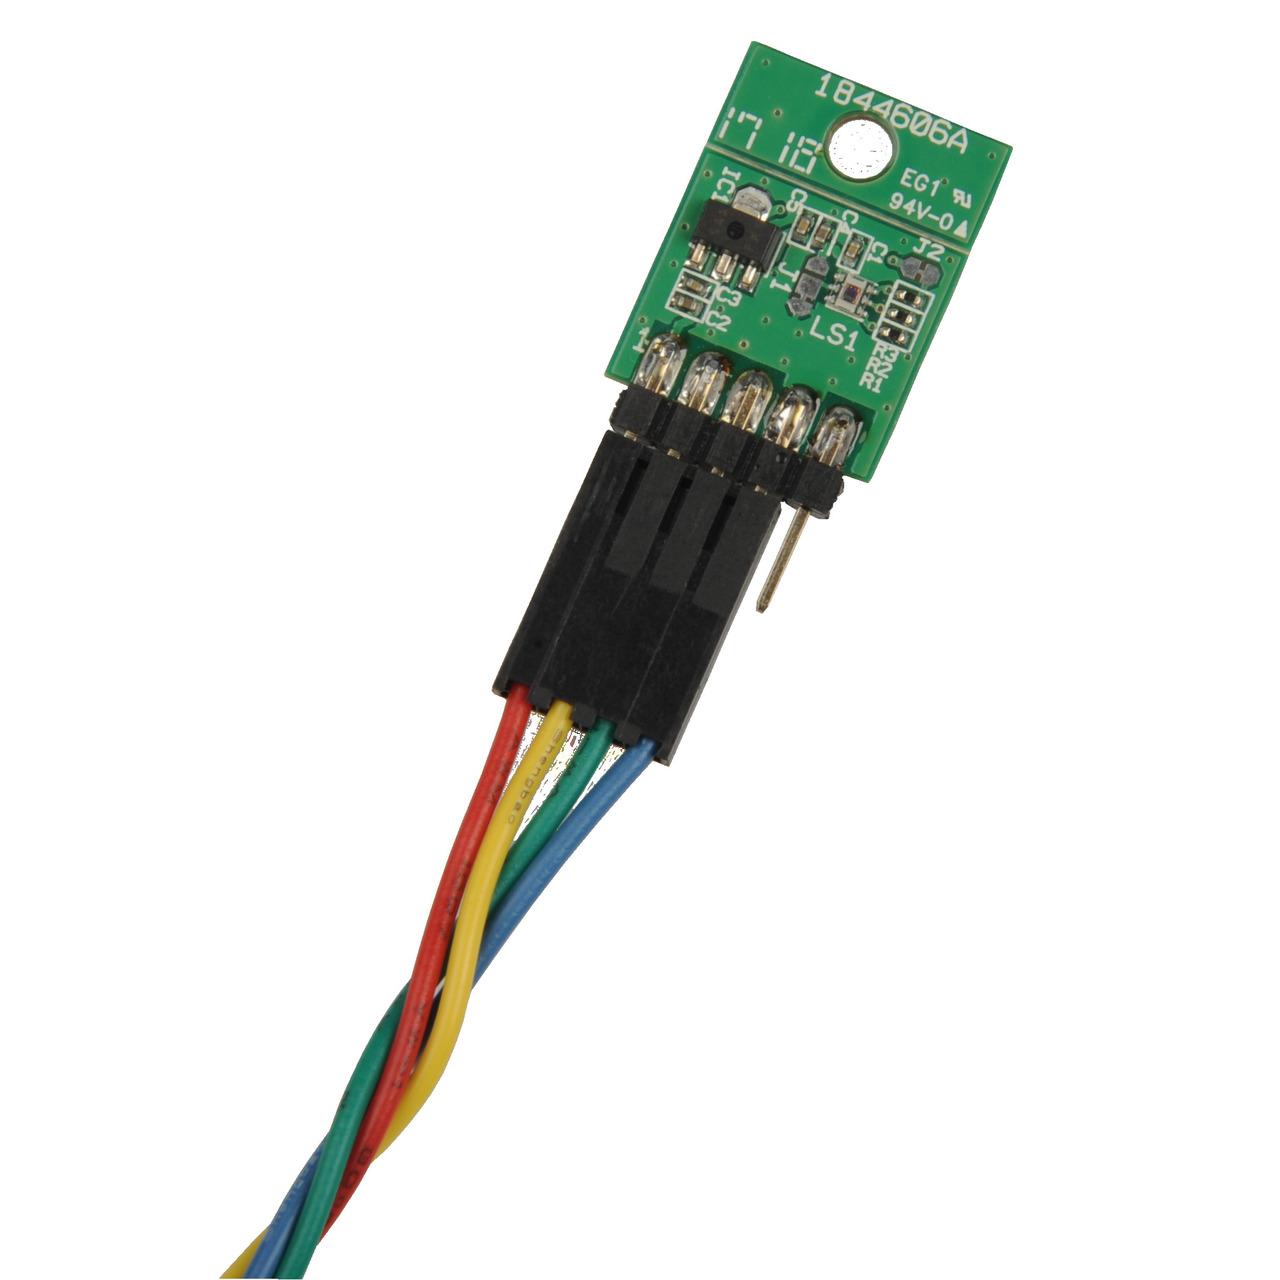 ELV Bausatz Lichtsensor OPT3001 mit I-C-Schnittstelle I2C-LS